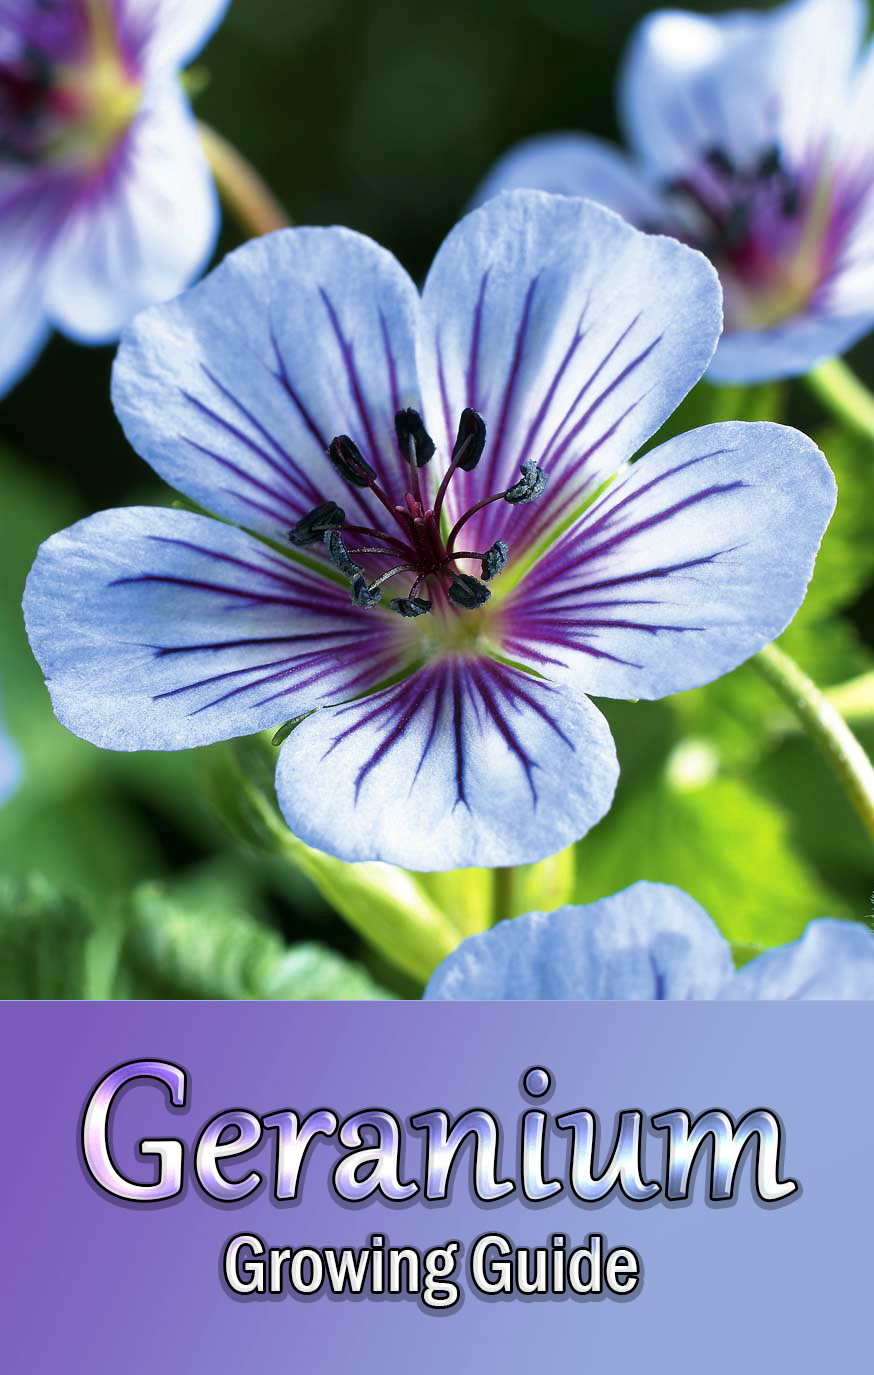 Geranium - Growing Guide